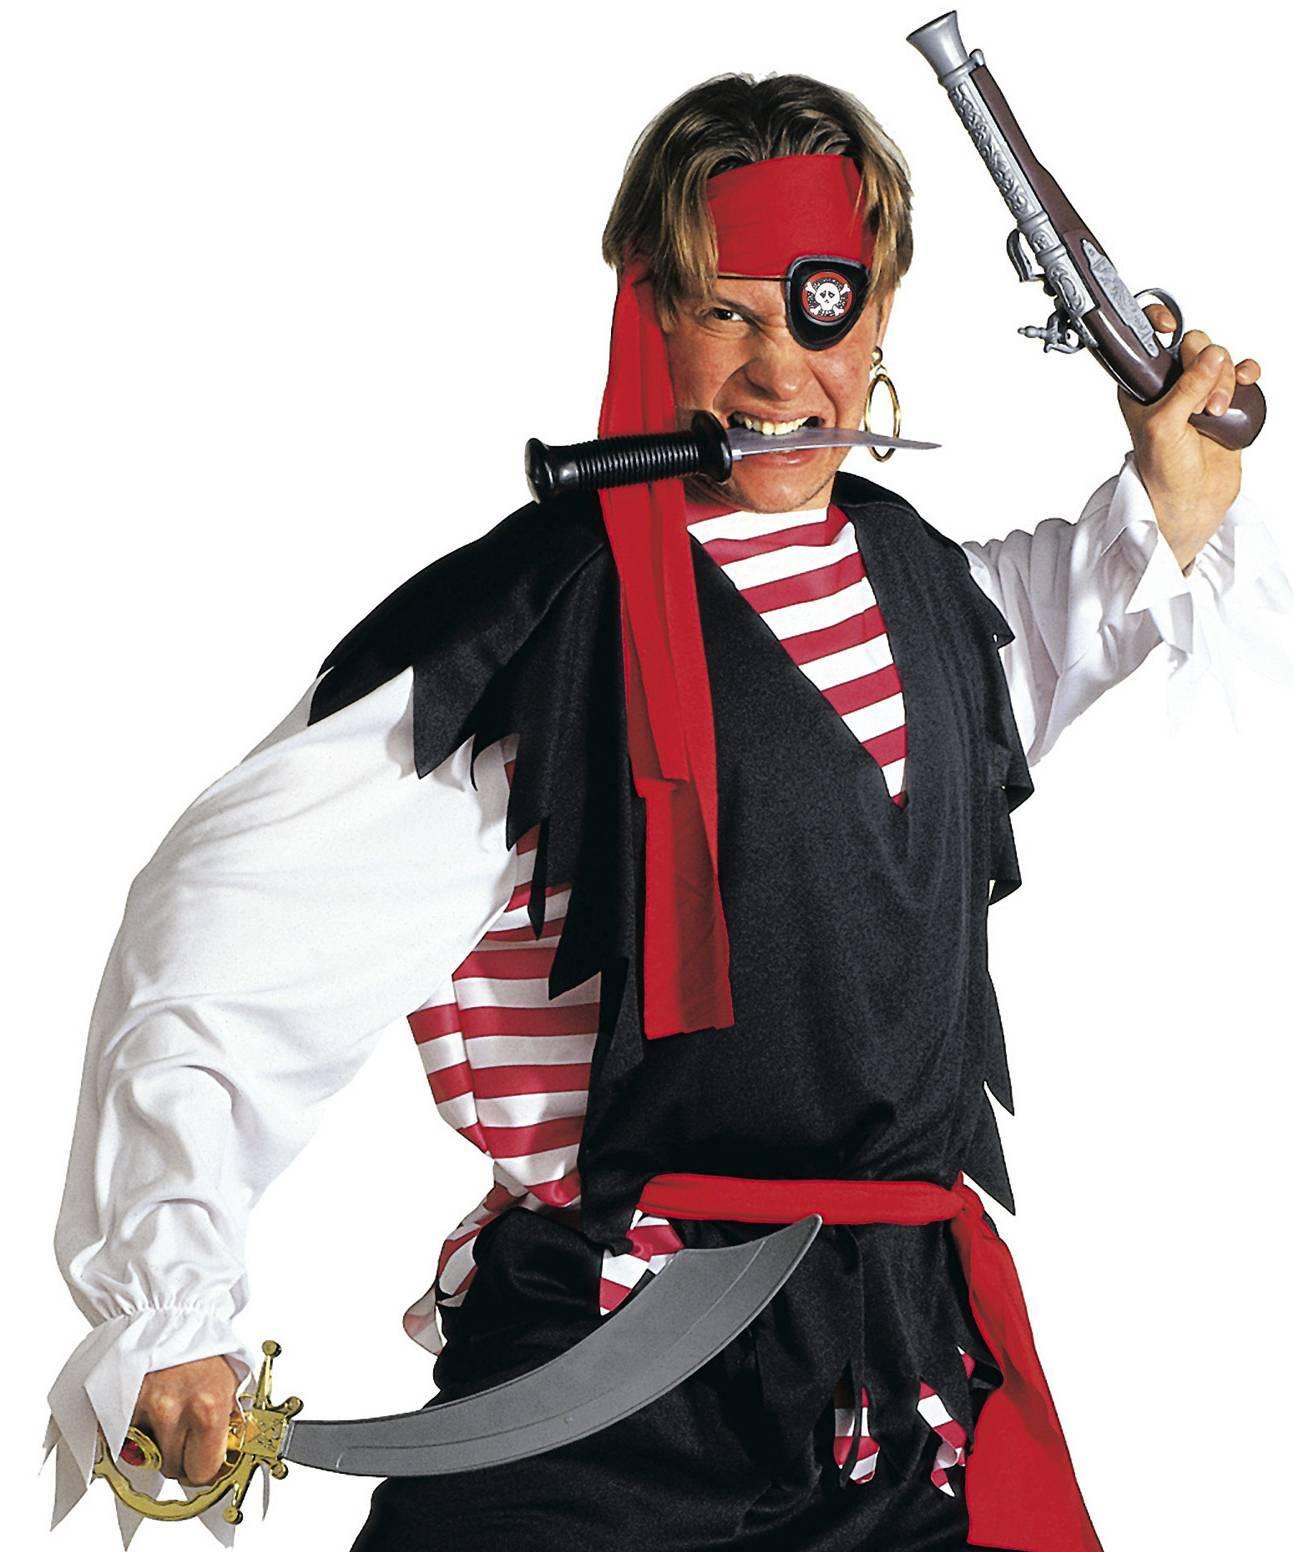 Sabre-de-pirate-3